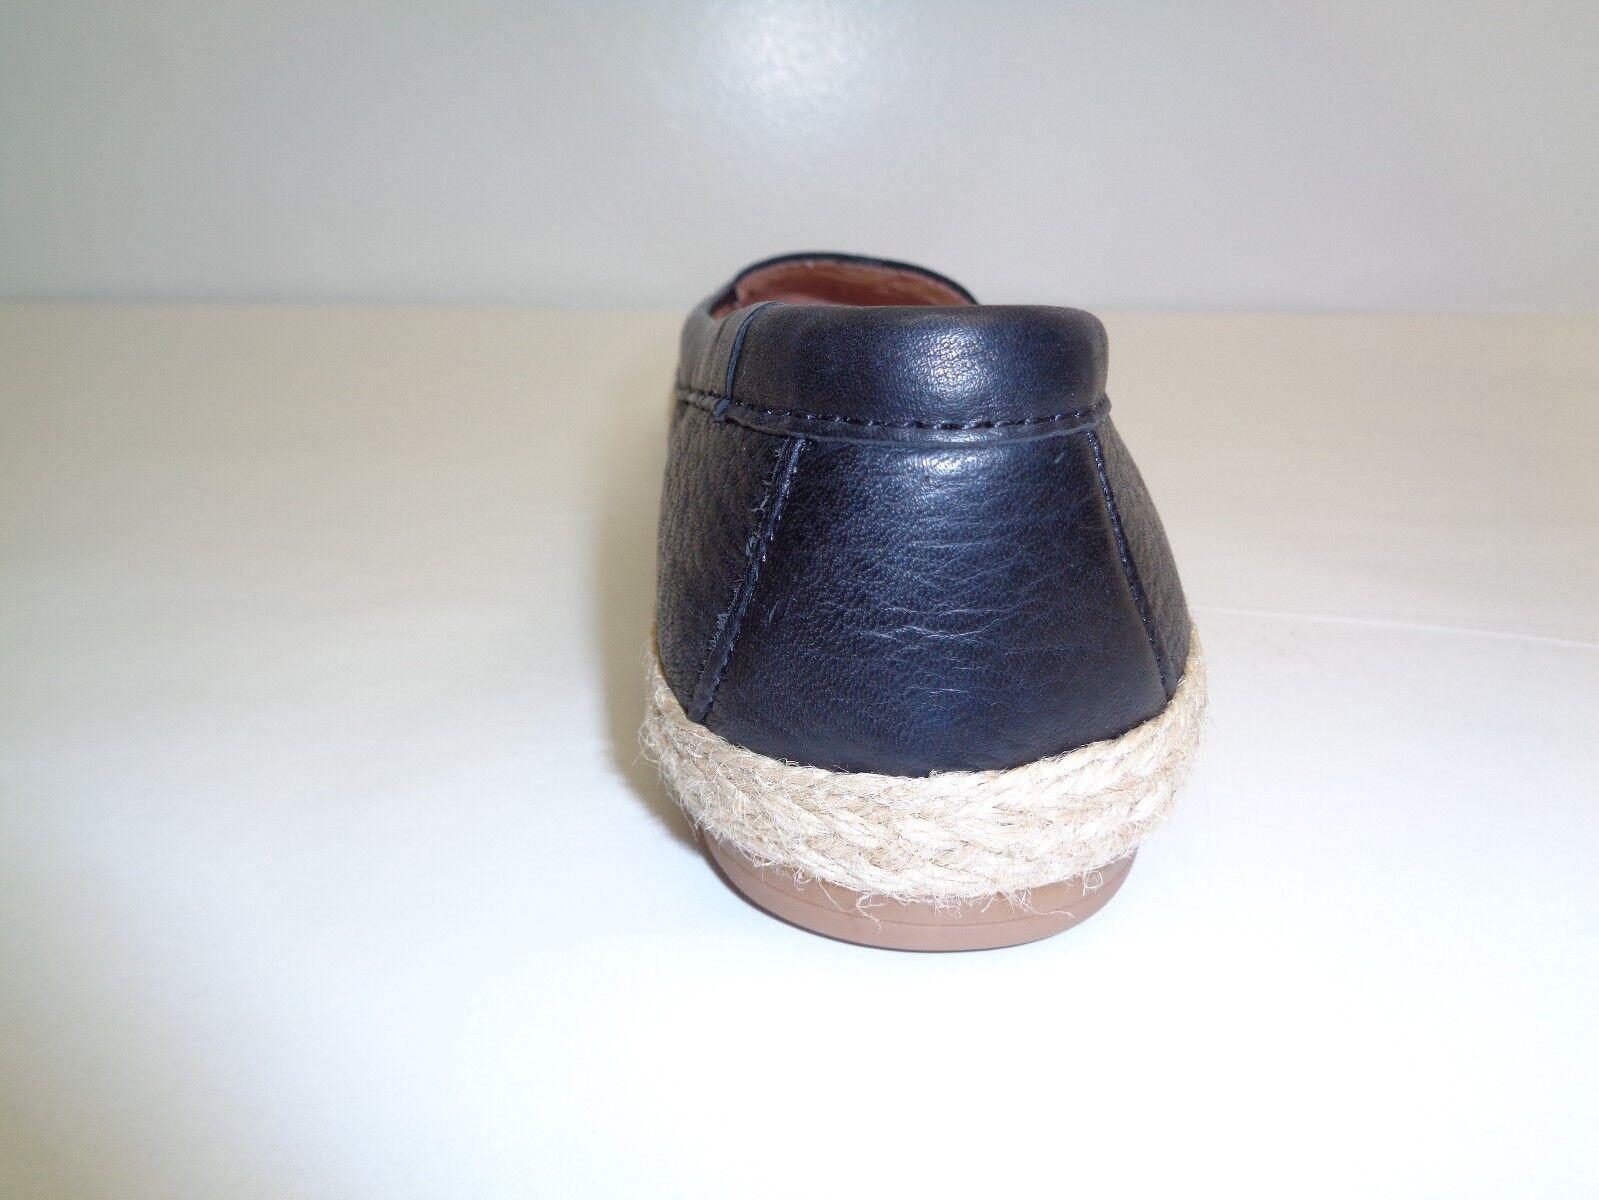 Sofft tamaño 6 M Mapúrpura Mocasines Negro Cuero Alpargatas Mocasines Mapúrpura Nuevos Mujer Zapatos sin Taco 81c087